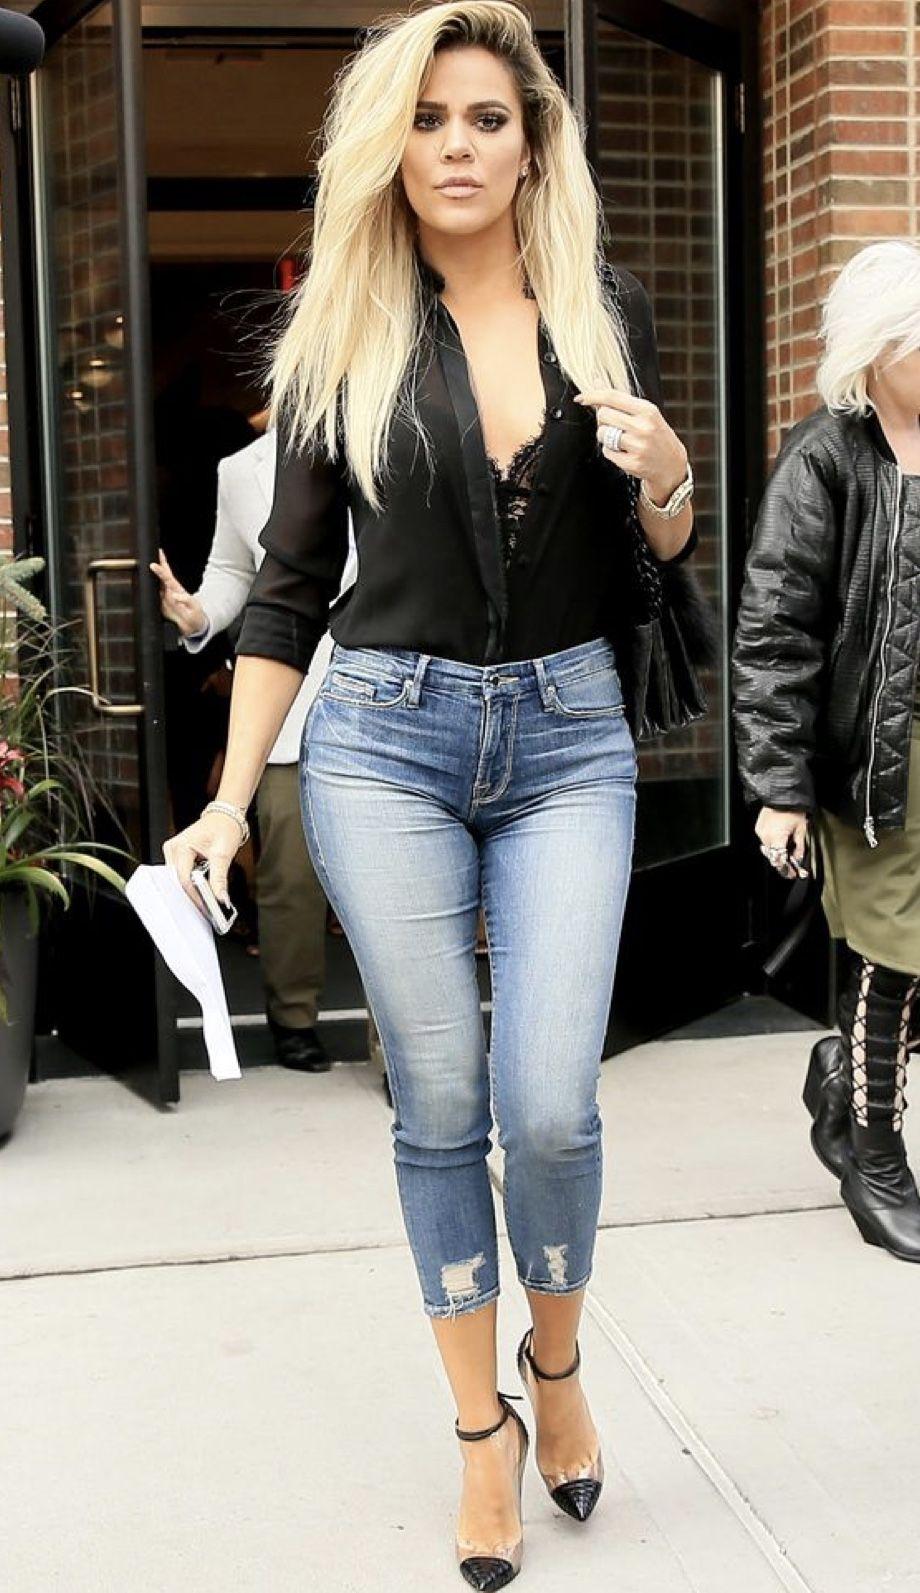 744df19990 Khloe Kardashian Style